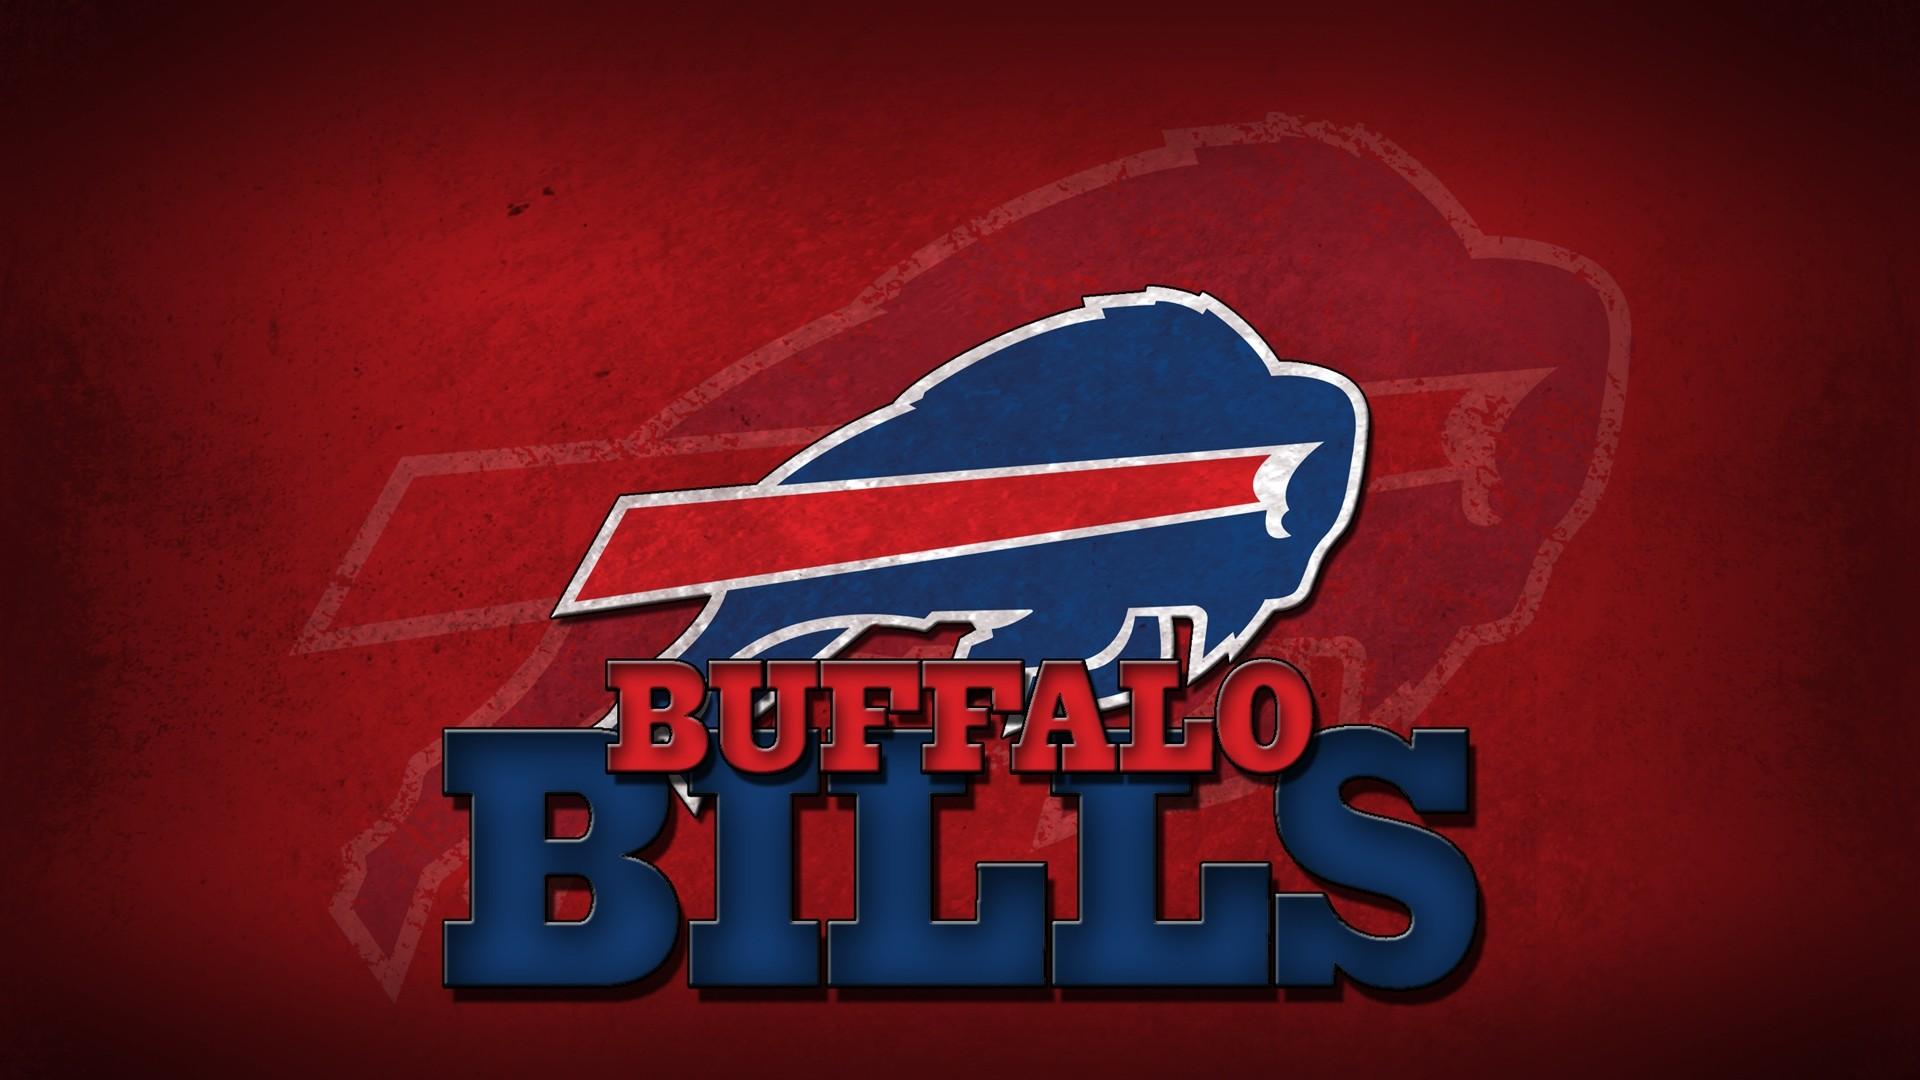 Buffalo Bills Wallpaper theme